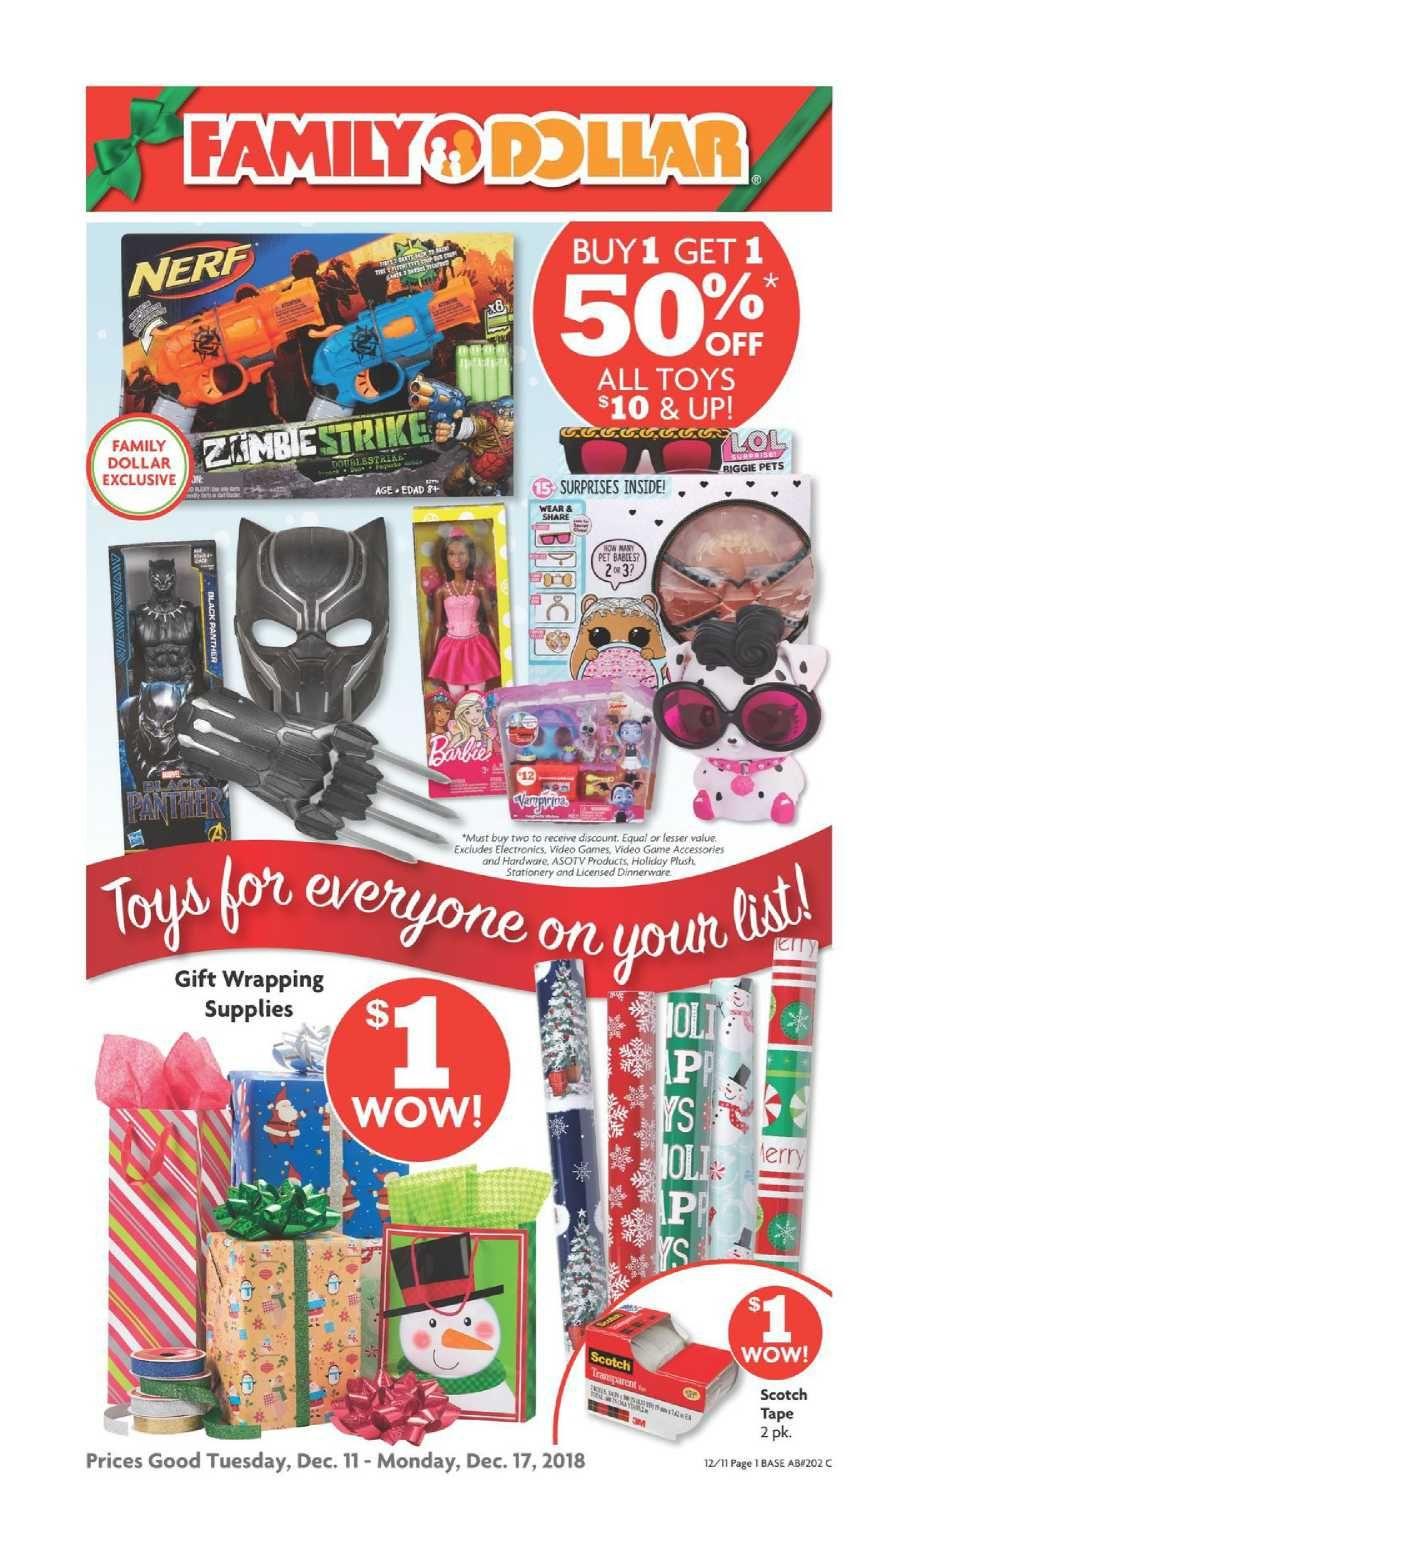 Family Dollar Weekly Ad Flyer February 14 February 20 2021 Weeklyad123 Com Weekly Ad Circular Grocery Stores Family Dollar Weekly Ads Dollar